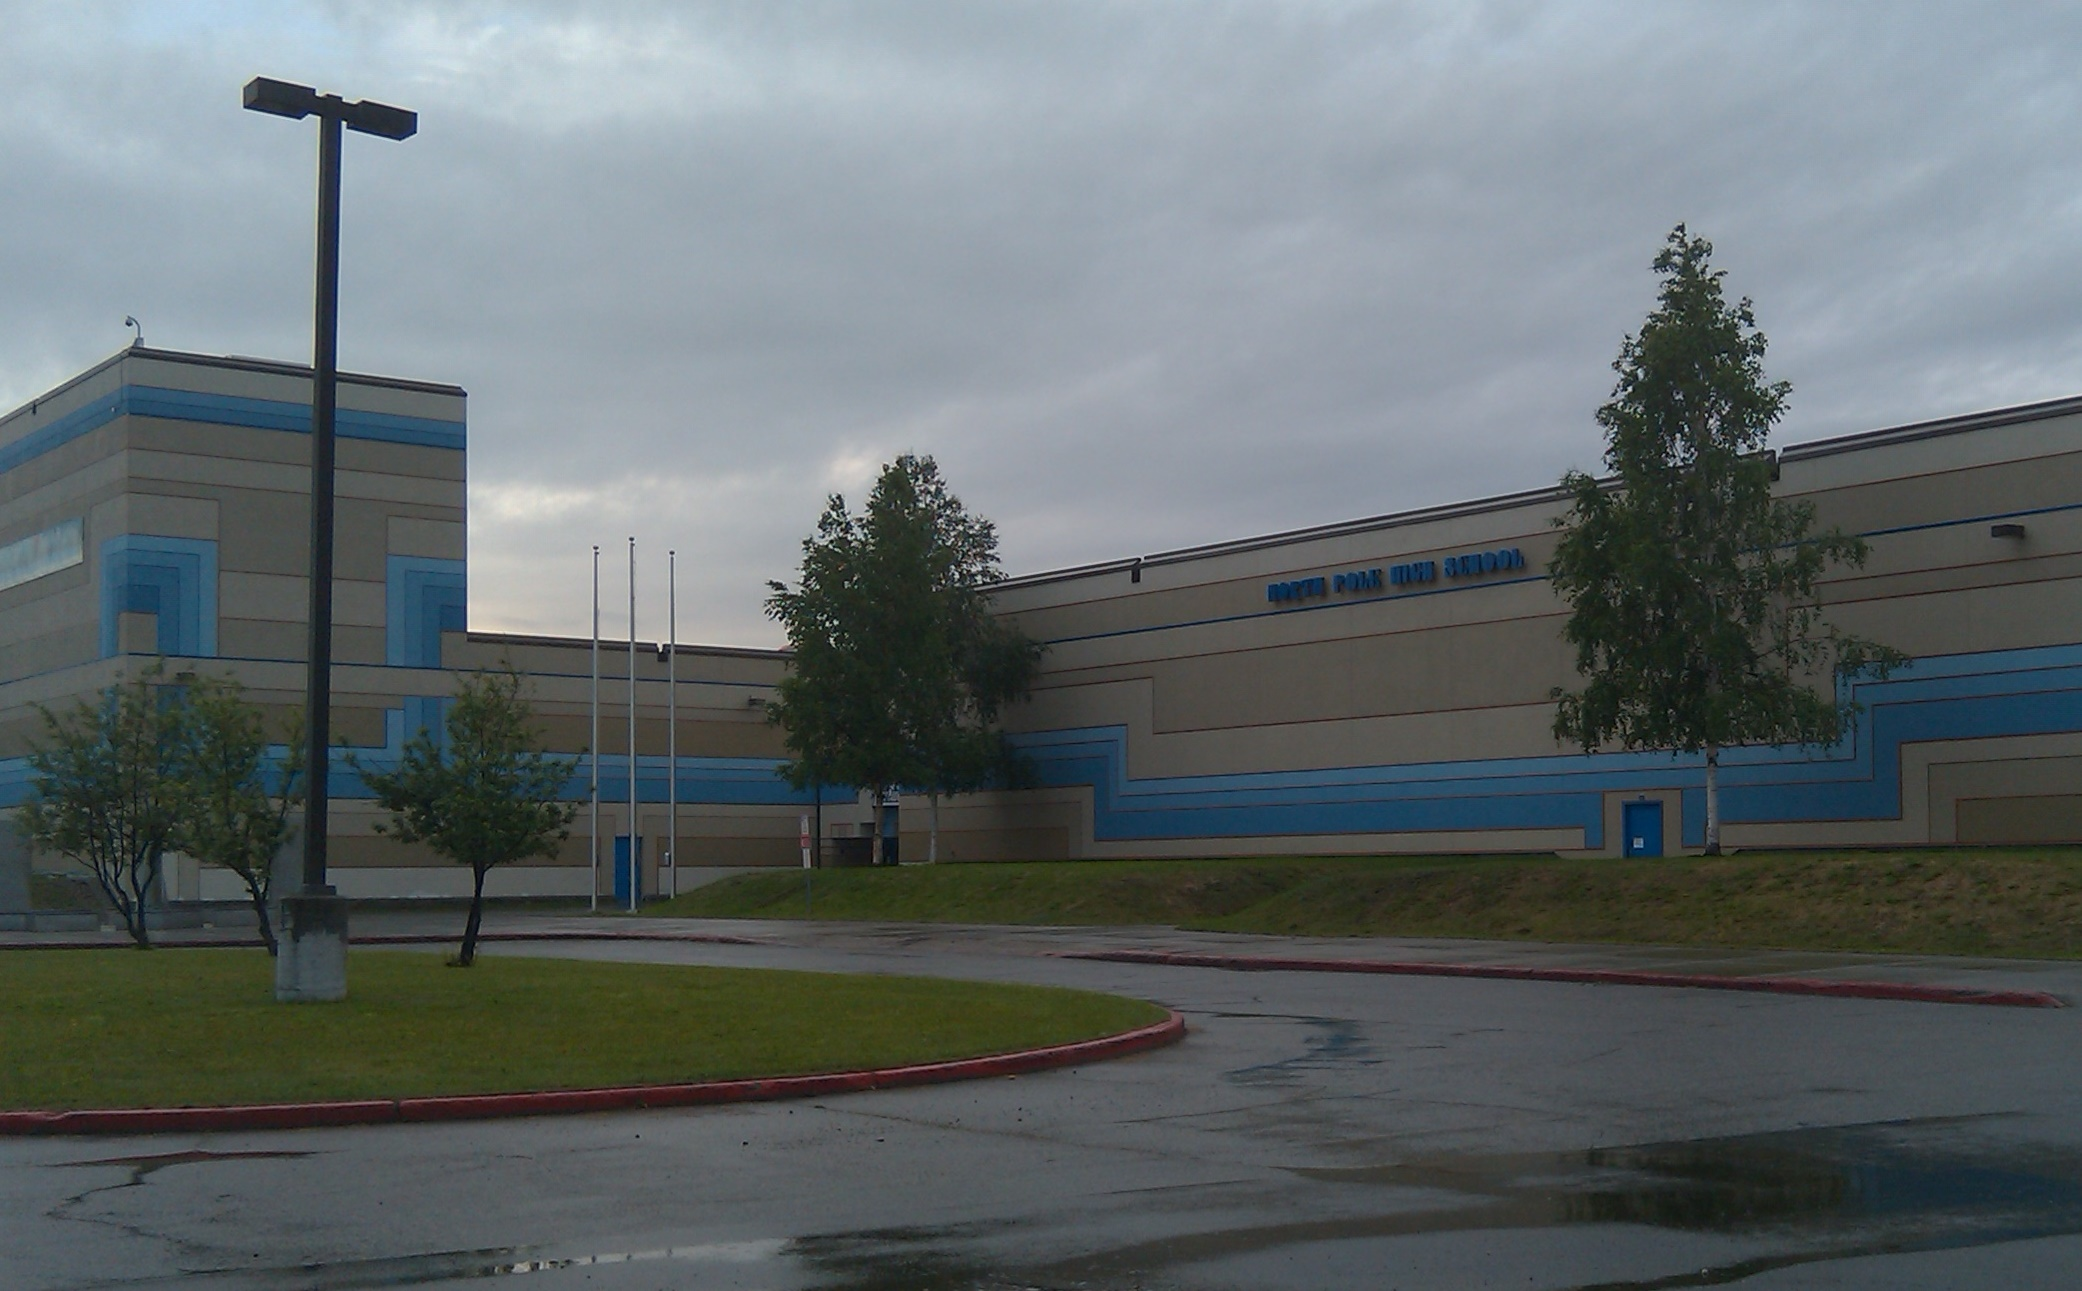 filenorth pole alaska high schooljpg wikimedia commons